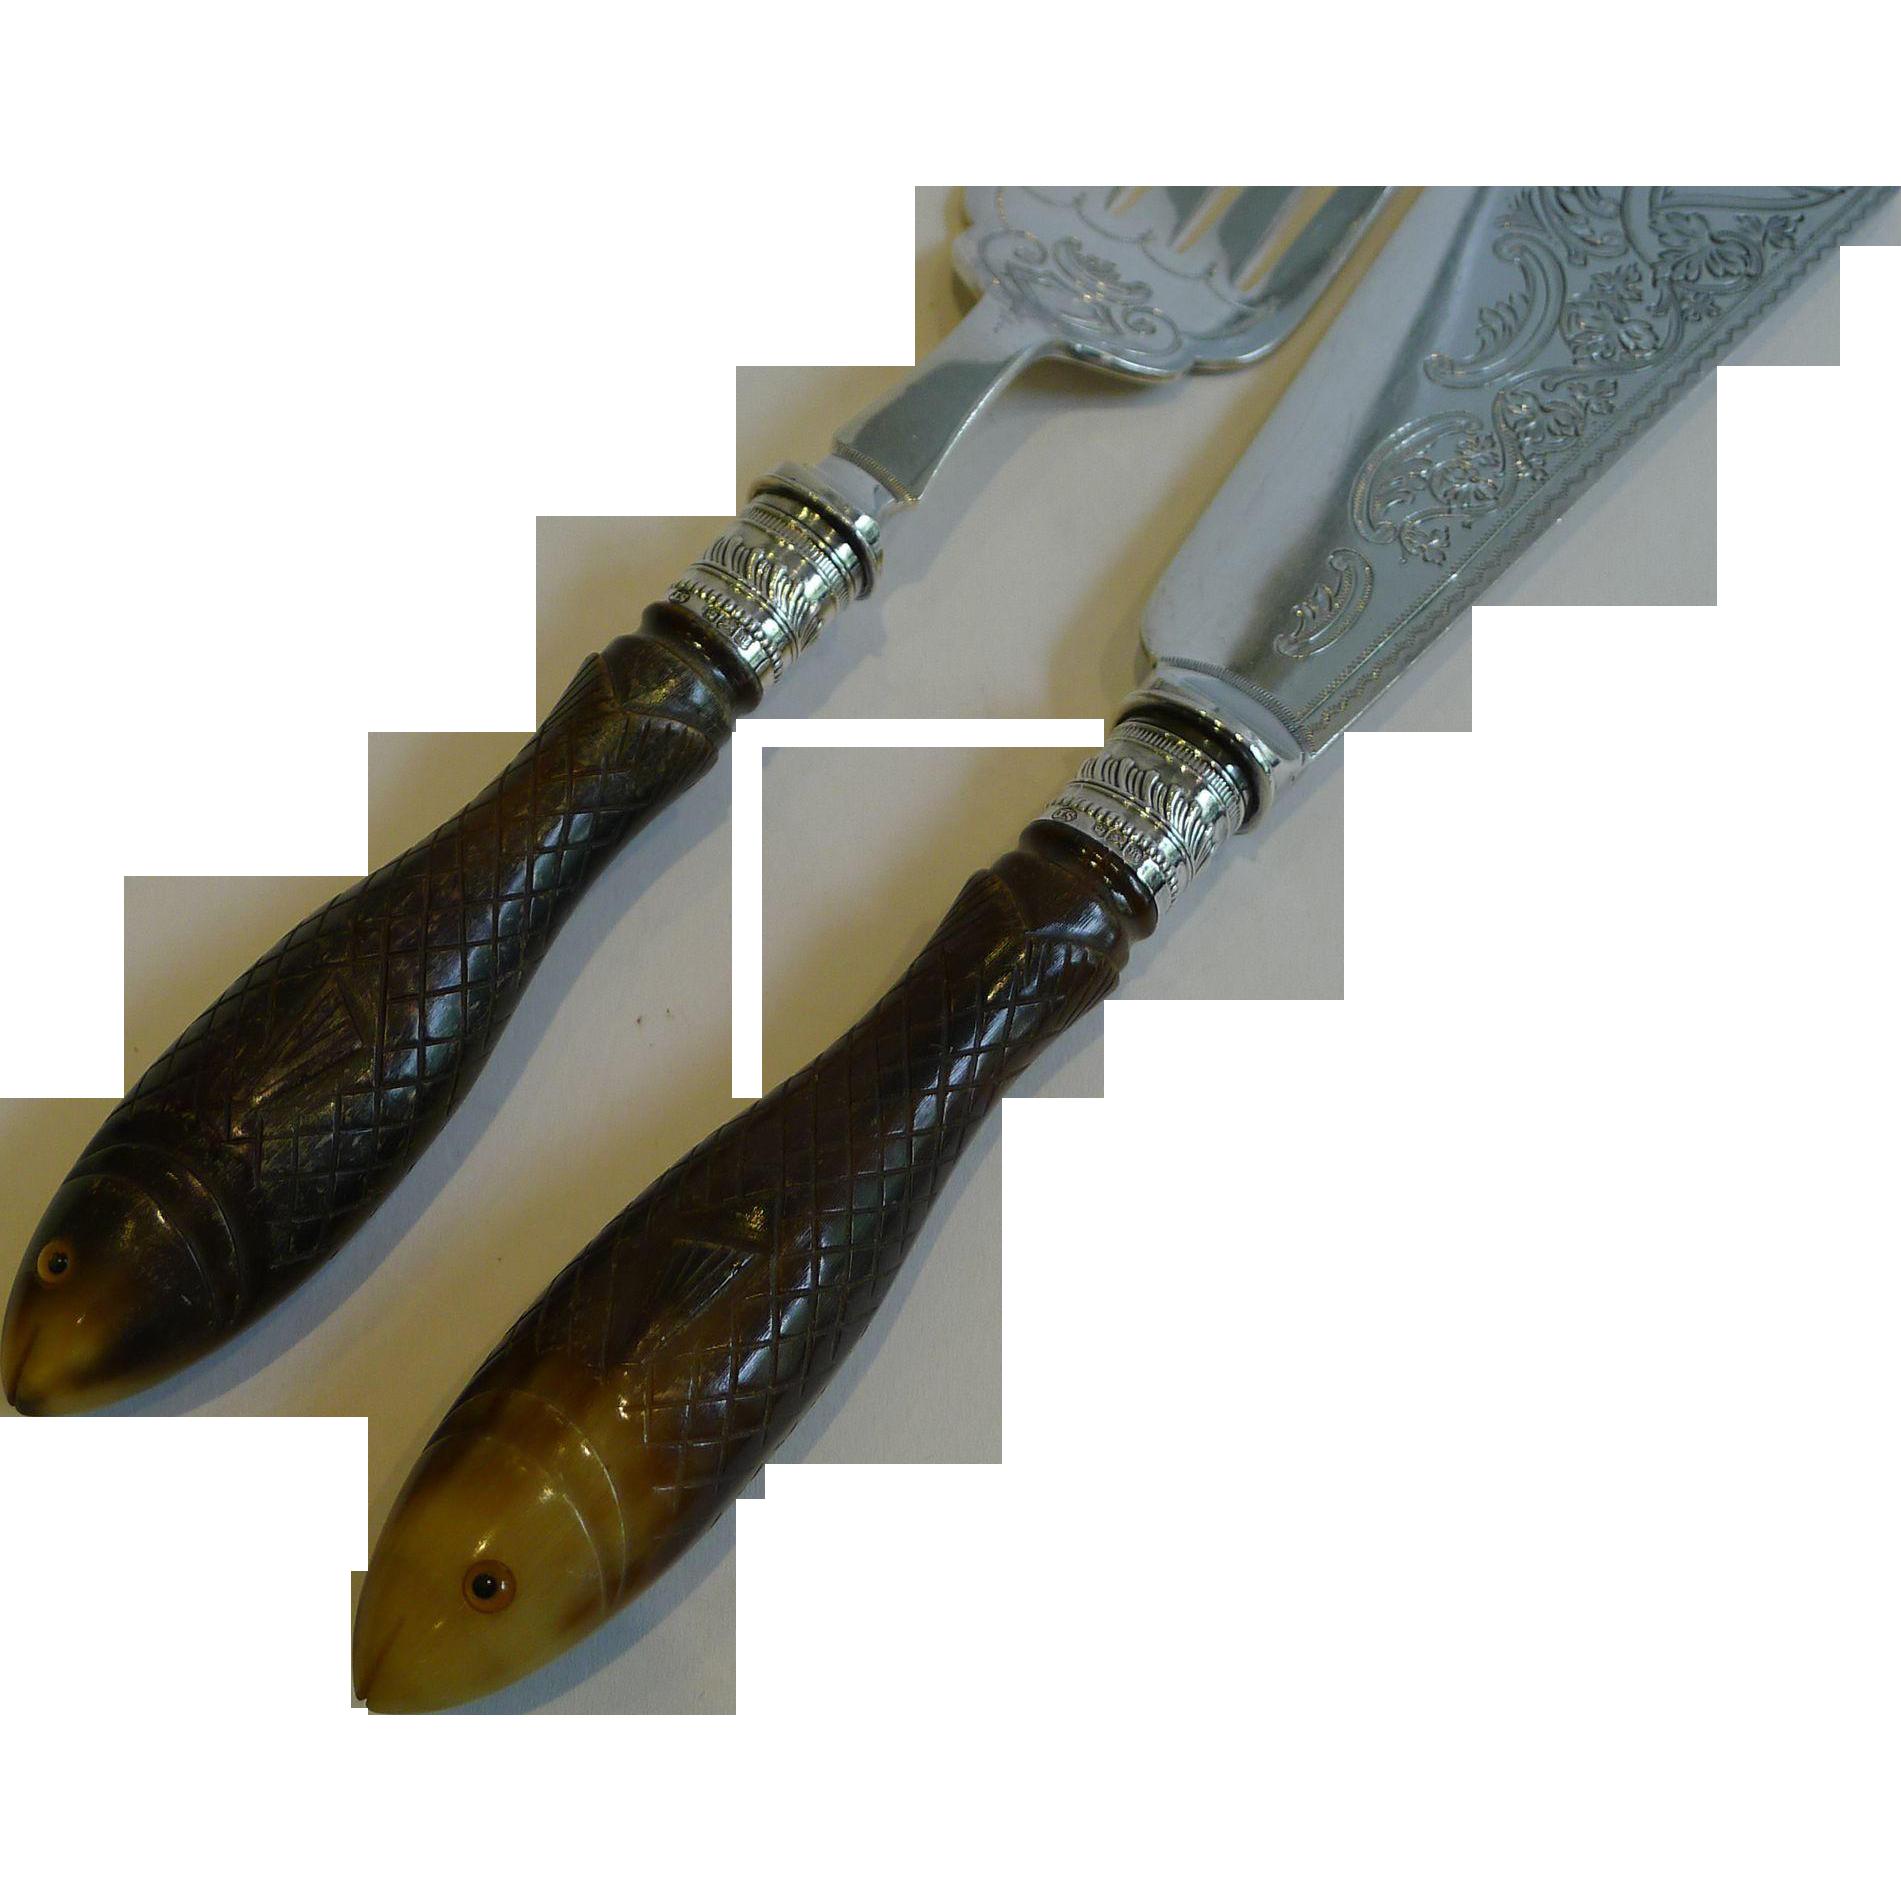 Rare Figural Fish Servers - Carved Fish Handles - 1904